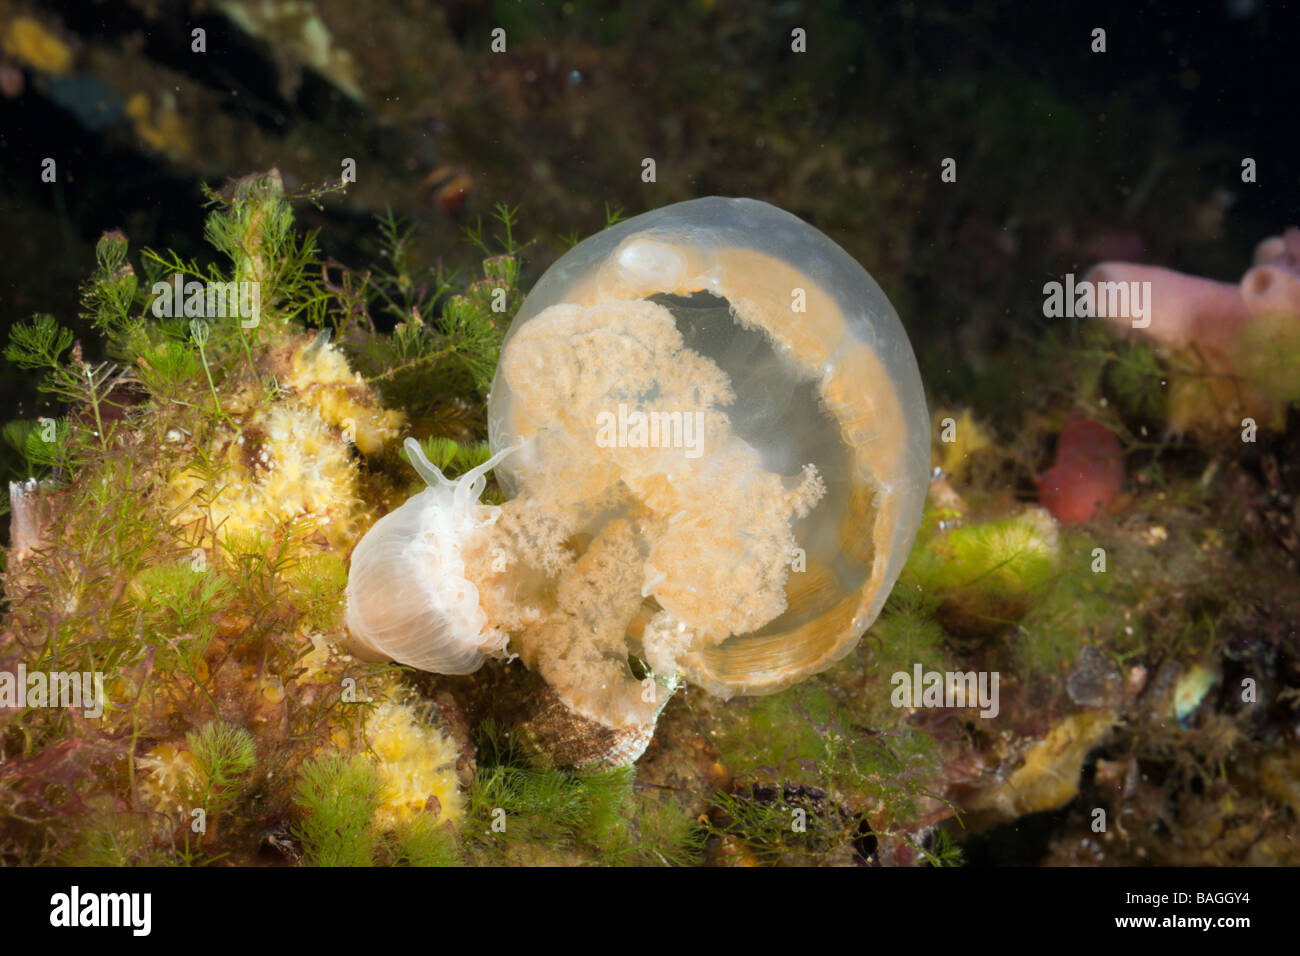 Anemone feed Jellyfish Entacmaea medusivora Mastigias papua etpisonii Jellyfish Lake Micronesia Palau - Stock Image